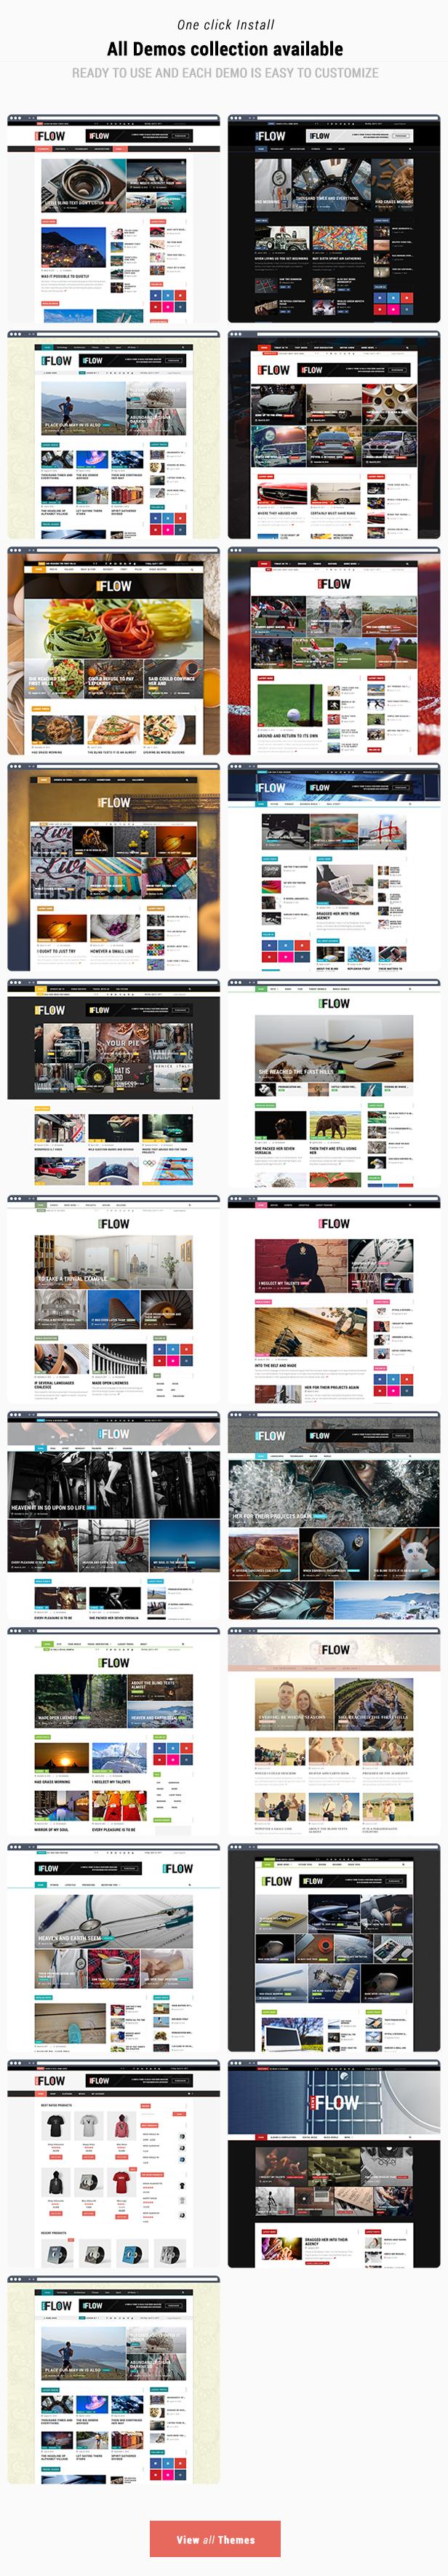 Flow News - Magazine and Blog WordPress Theme - 3